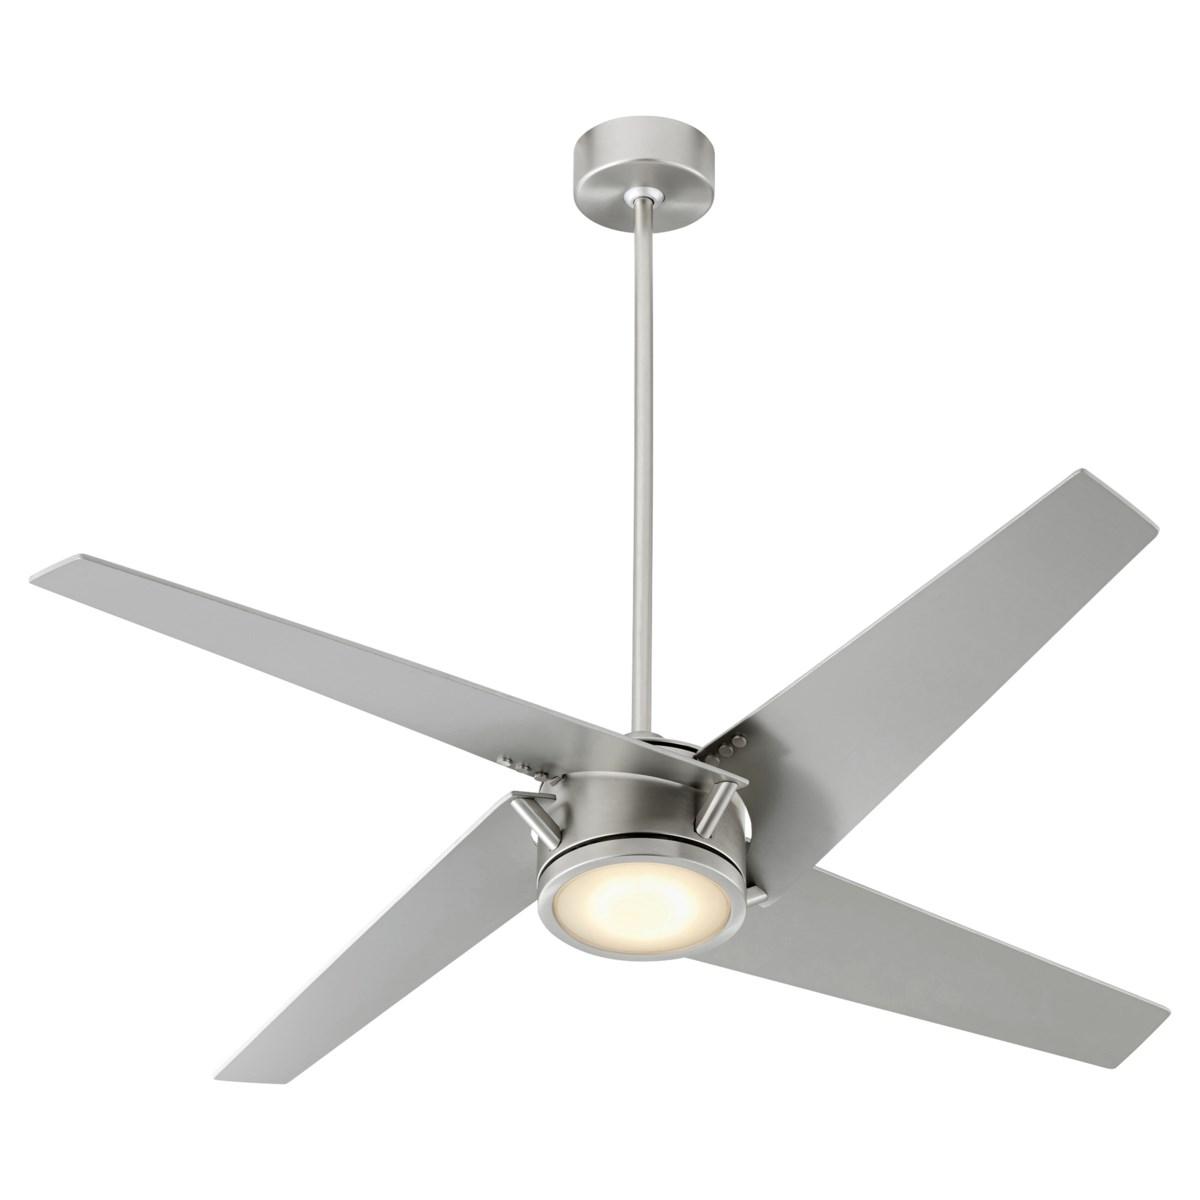 "Axis 54"" Satin Nickel Ceiling Fan"